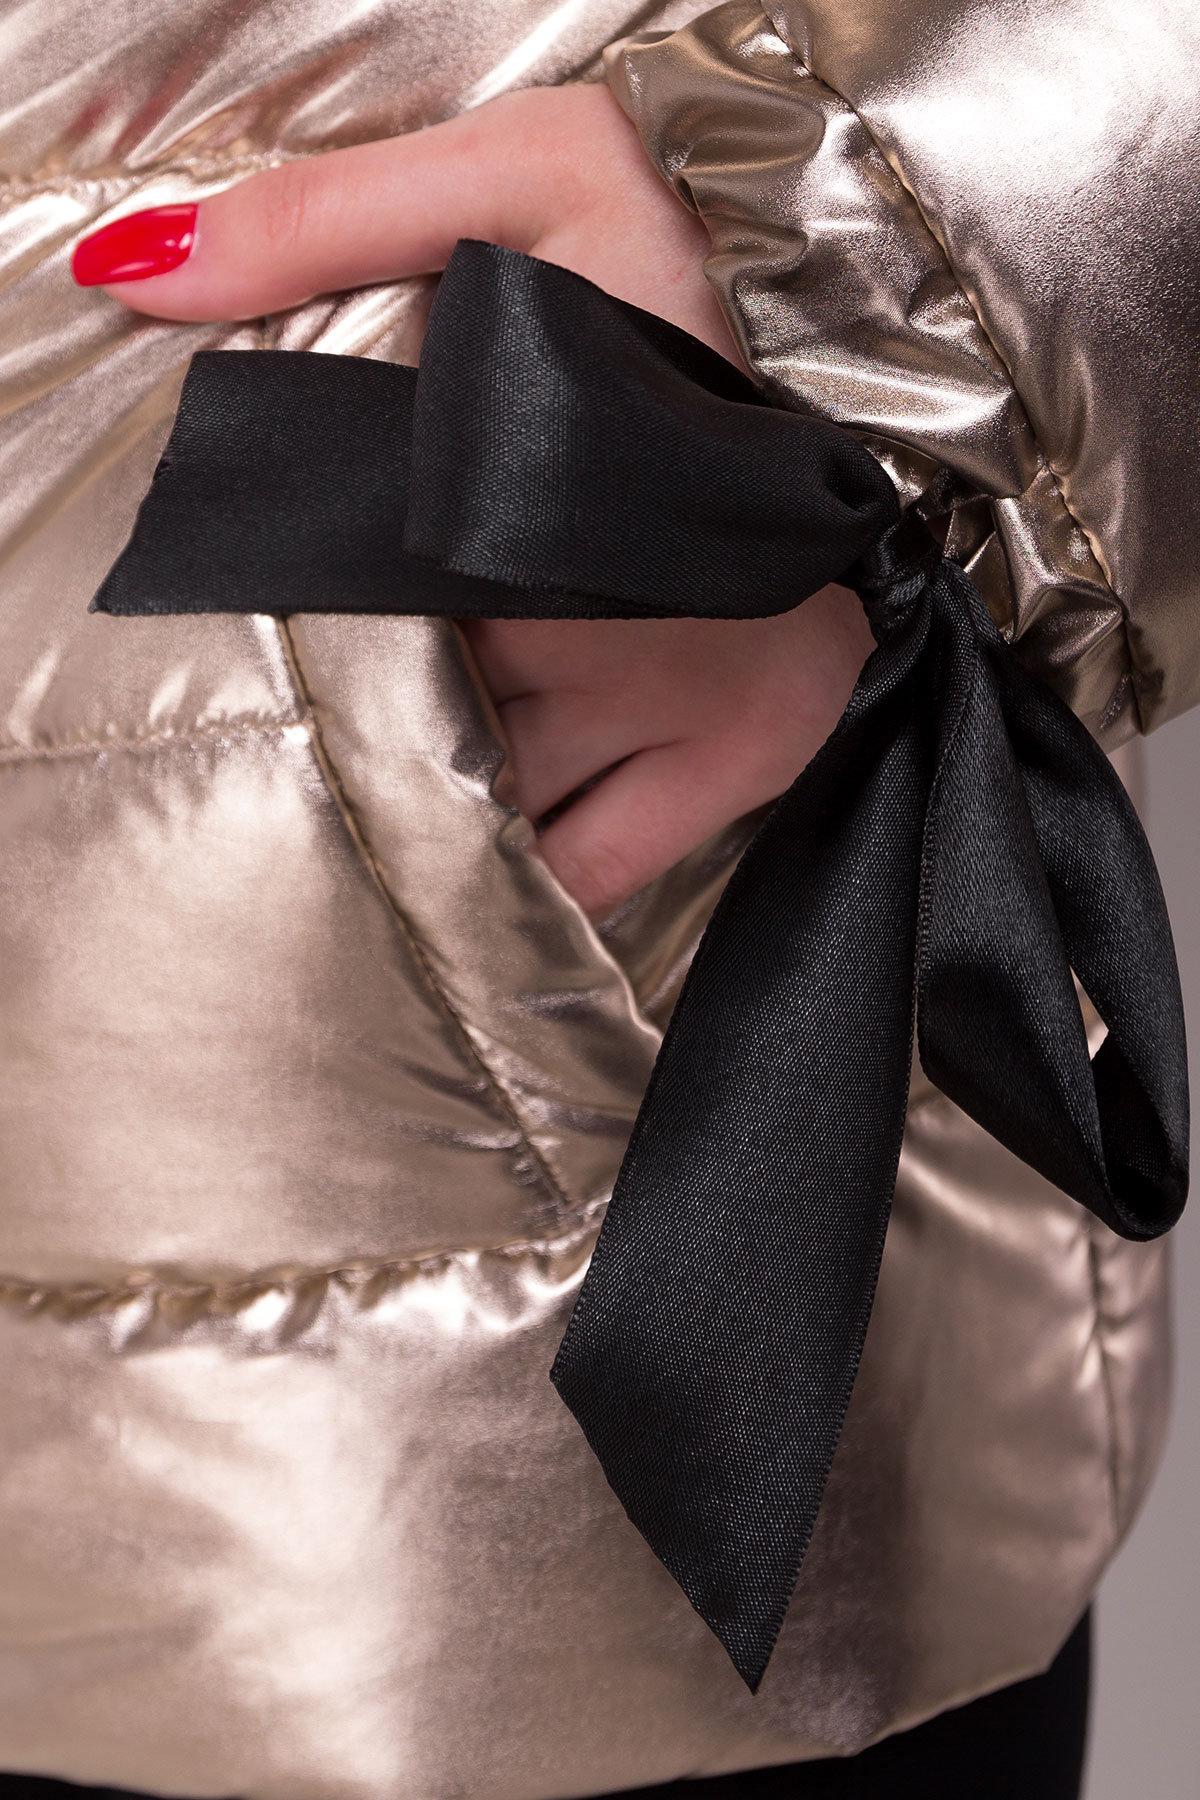 Куртка металлик Эллария 4589 АРТ. 21749 Цвет: Золото - фото 4, интернет магазин tm-modus.ru